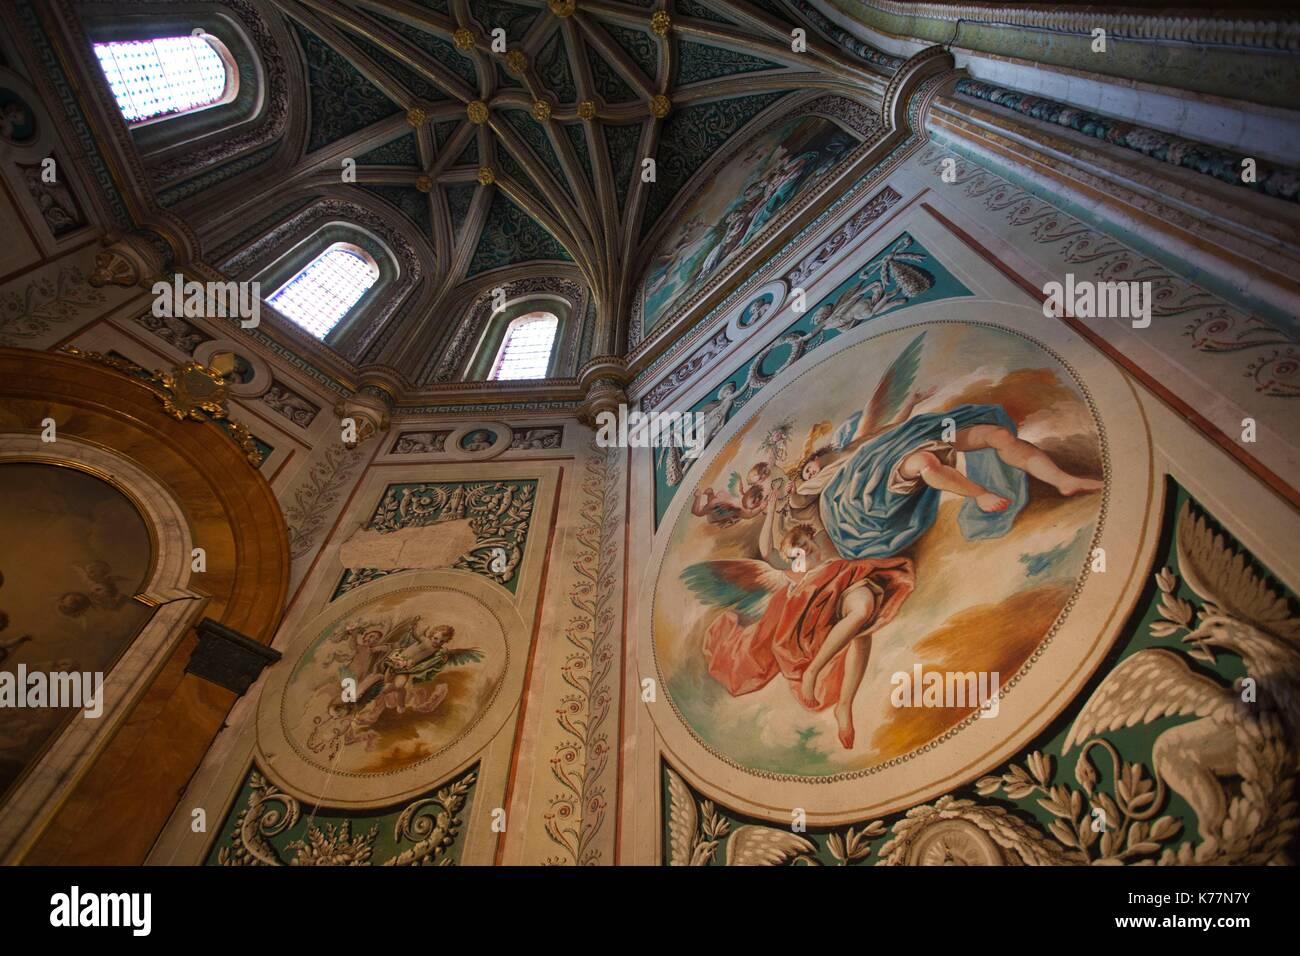 Spanien, Castilla y Leon Region, Provinz Segovia Segovia Segovia Kathedrale, religiöse Kunst Stockbild